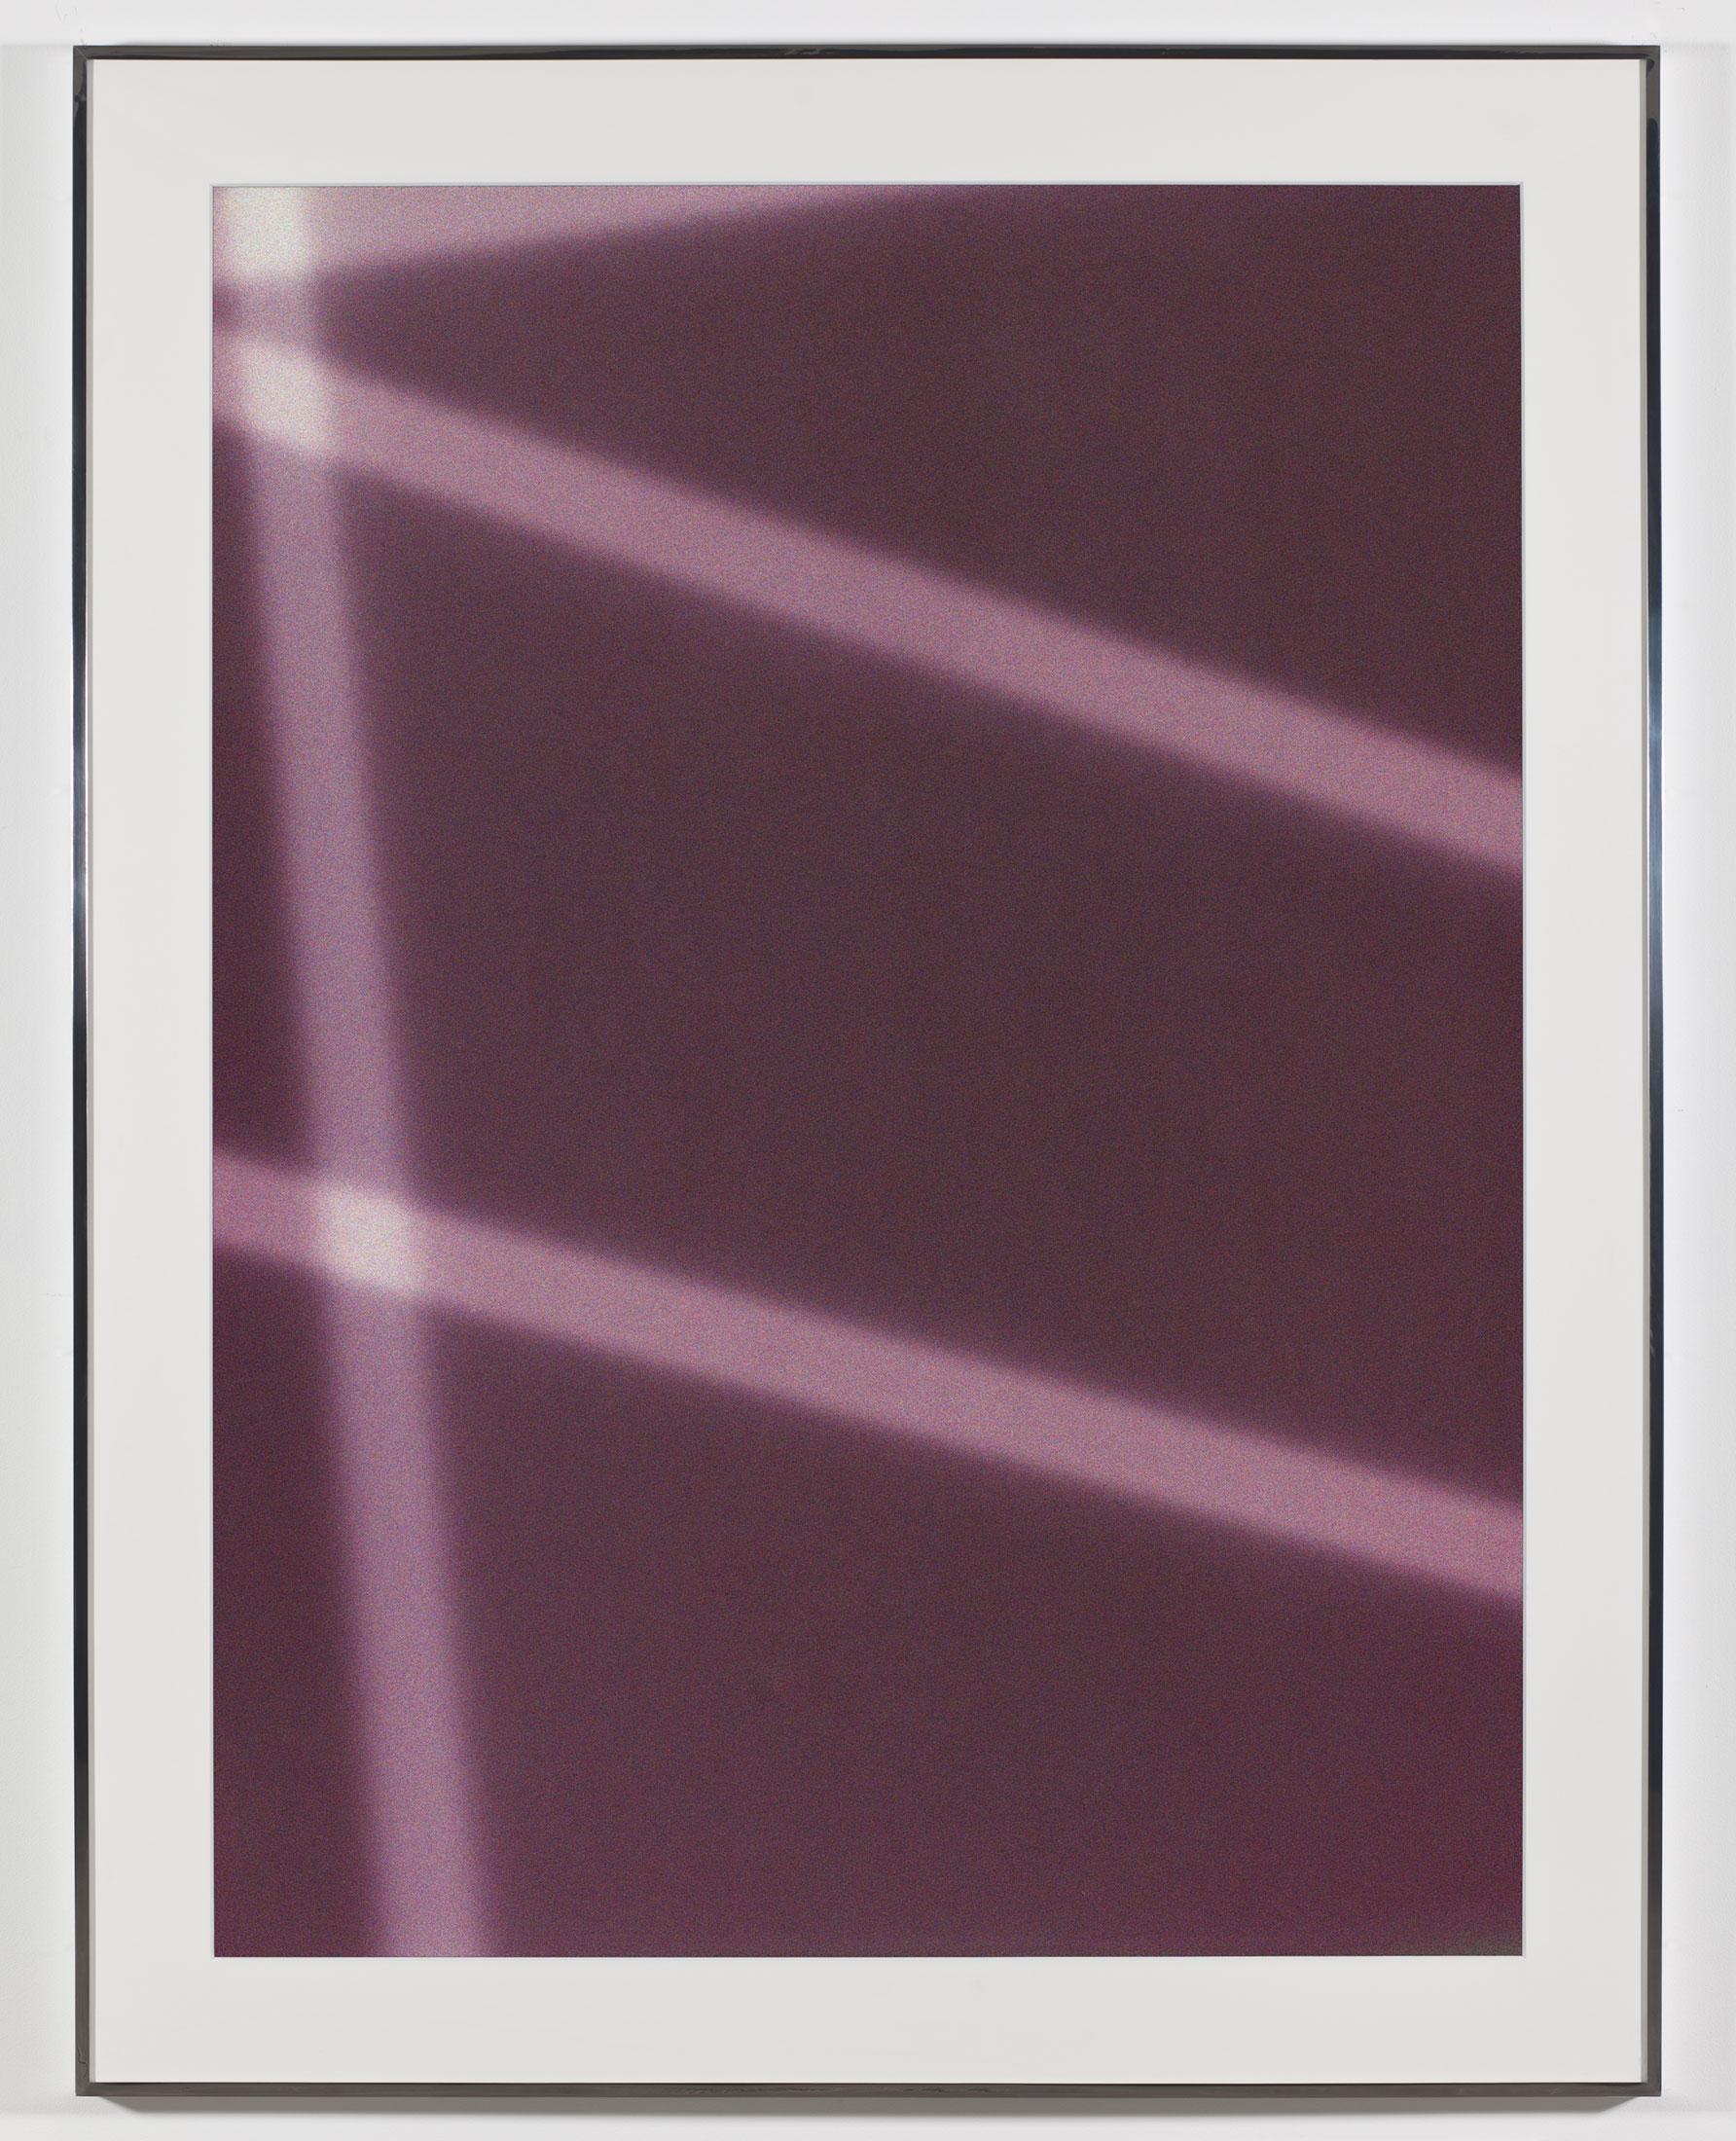 Transparency (Negative) [Kodak Portra 400NC Em. No. 2001: May 8–July 18, 2007 LAX/FRA FRA/JFK LGA/IAD IAD/ORD]    2009   Epson Ultrachrome K3 archival ink jet print on Museo Silver Rag Paper  68 x 52 1/4 inches   Transparencies, 2008–2014